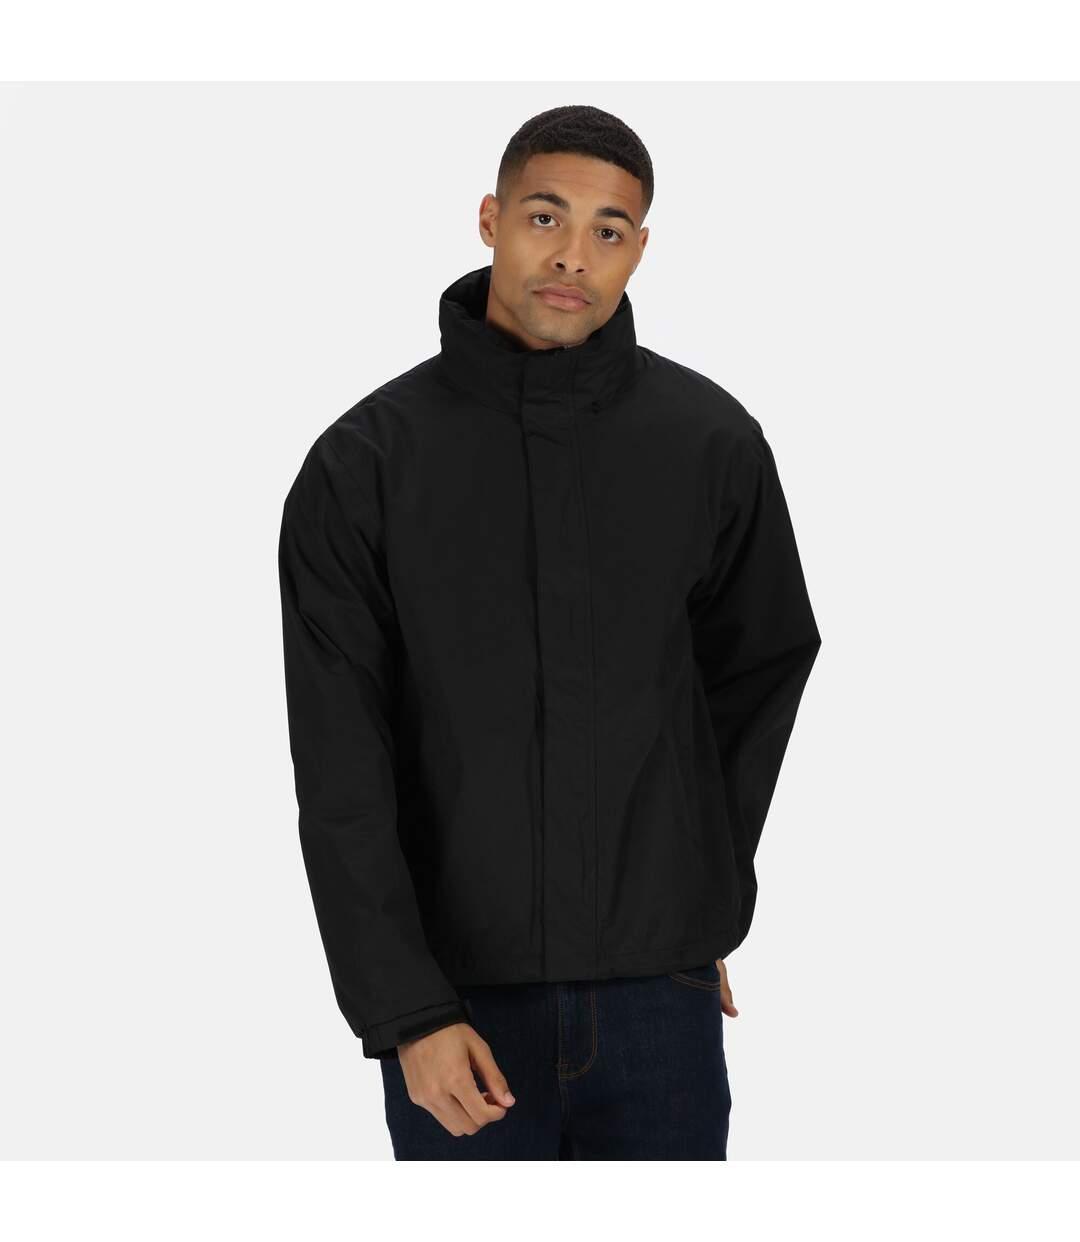 Regatta Mens Pace II Lightweight Waterproof Jacket (Black) - UTRG1546